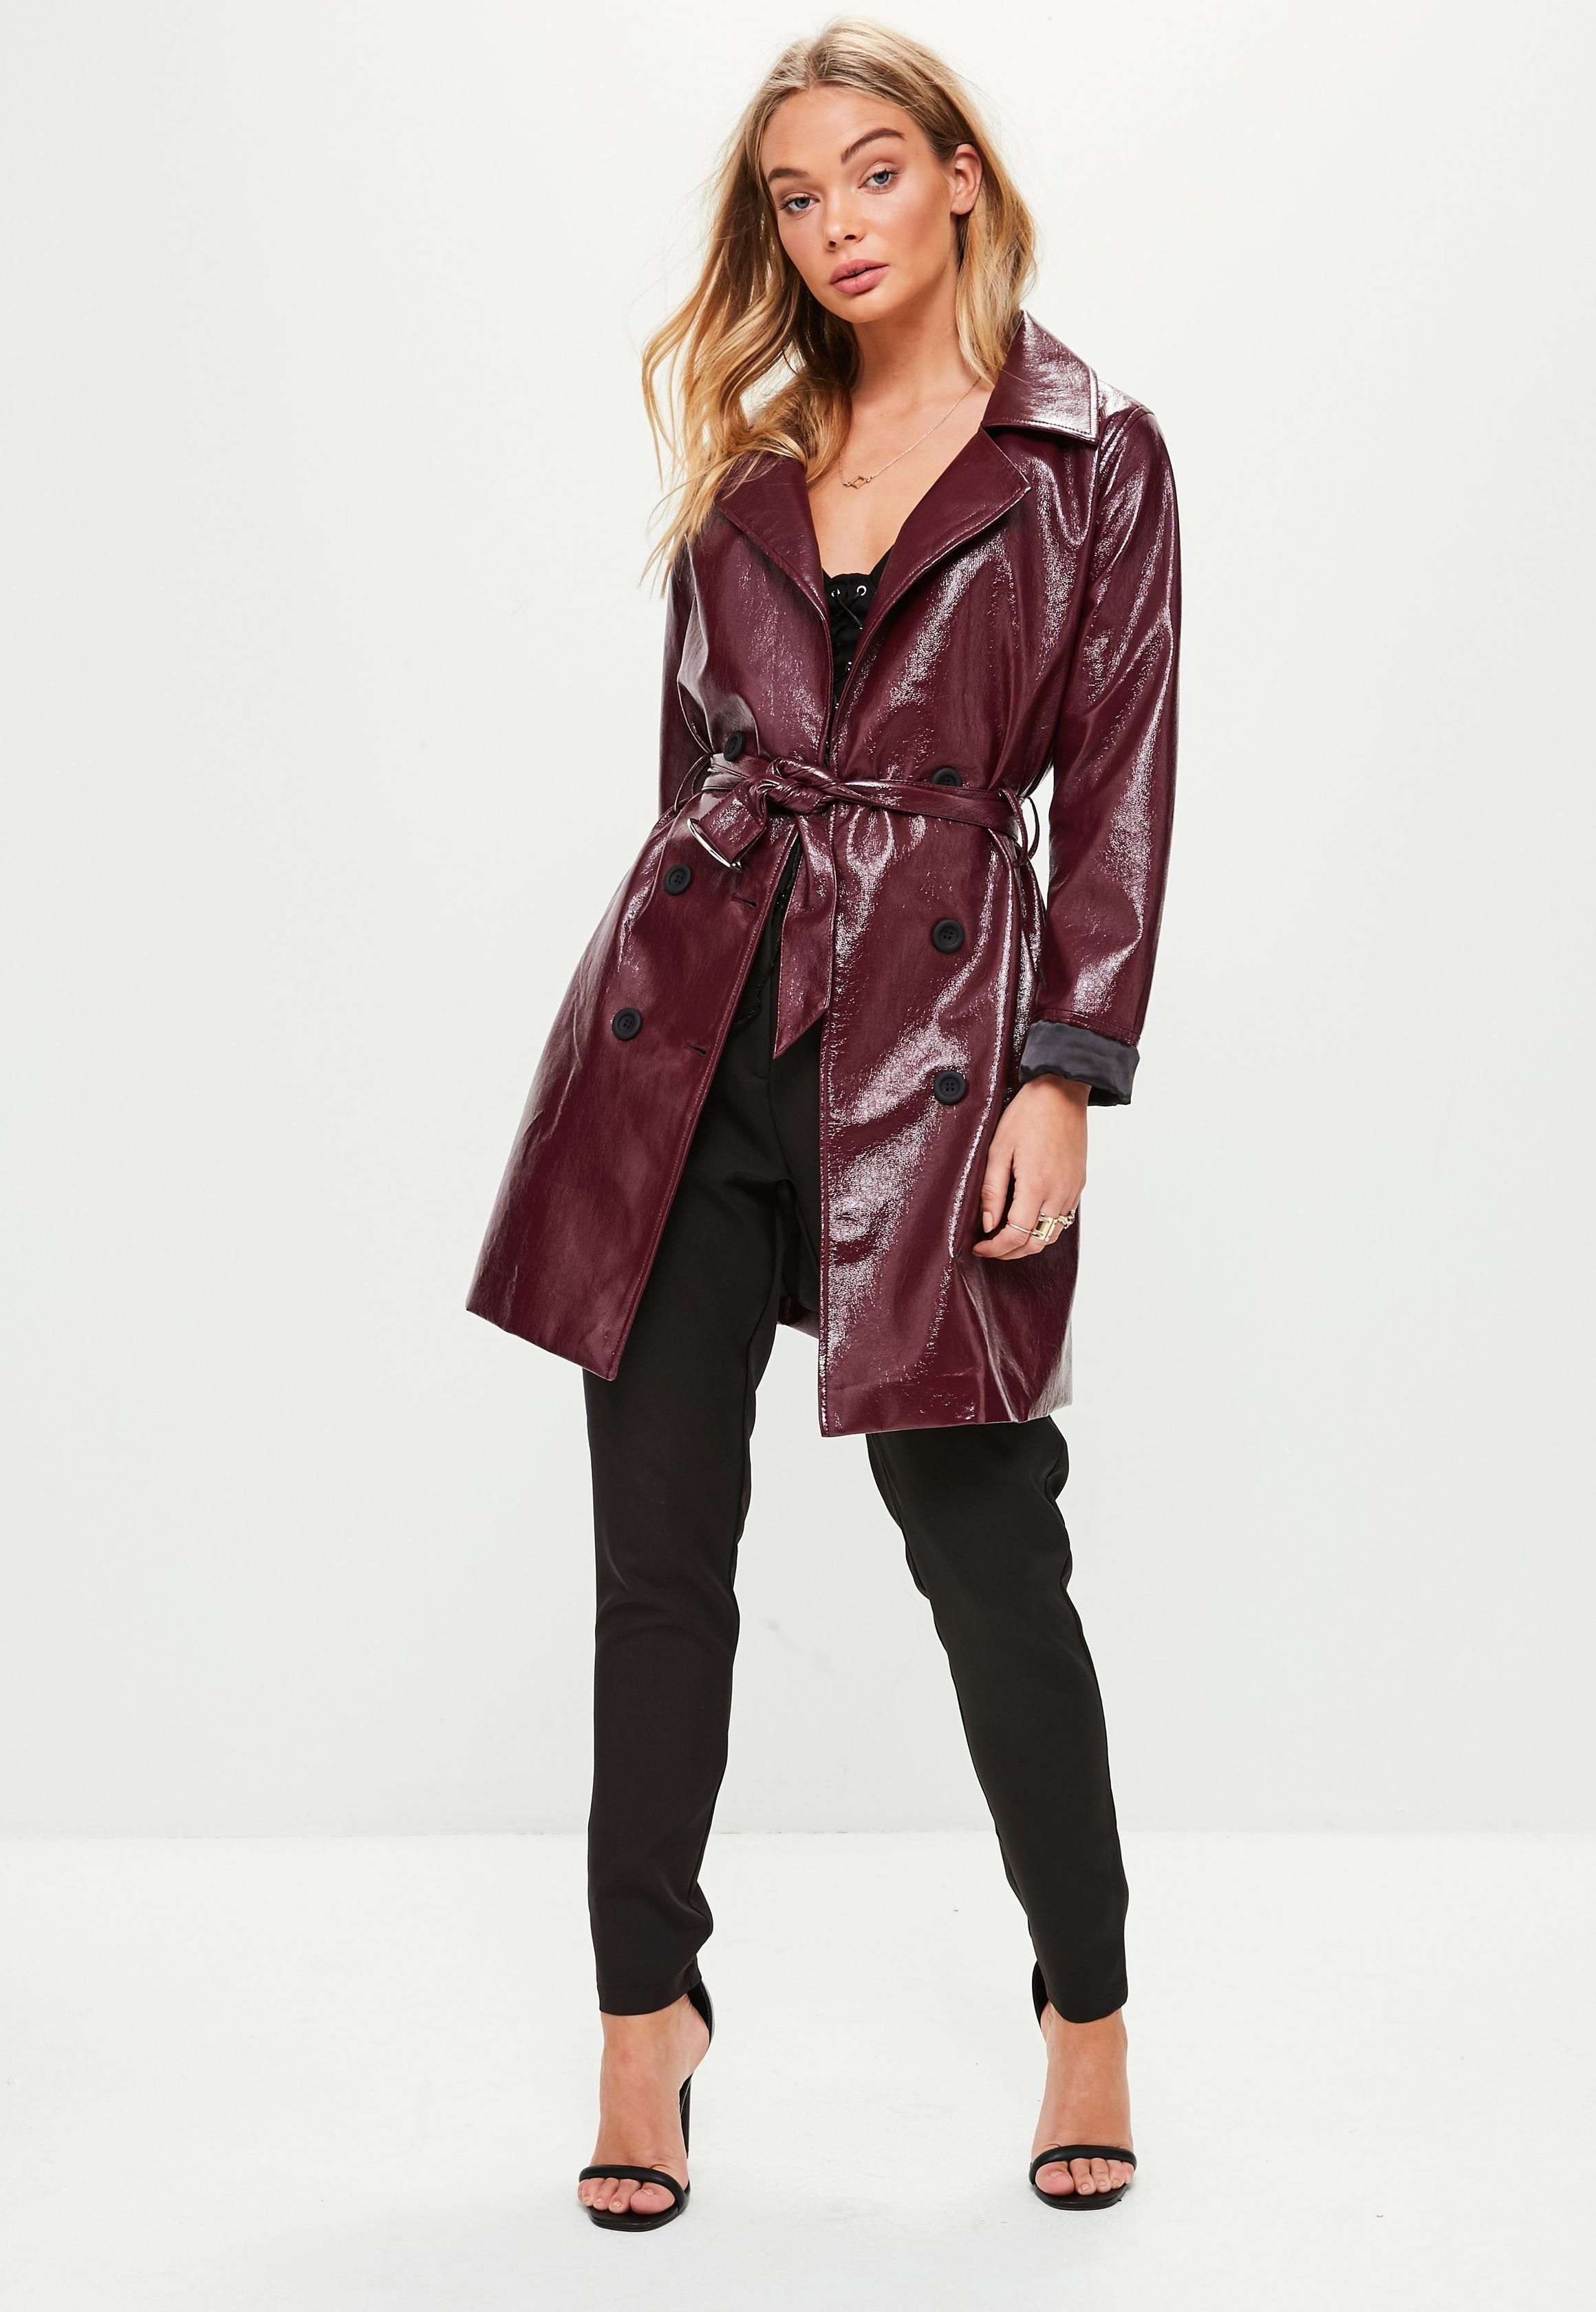 7dc0edb39 Burgundy Vinyl Trench   Missguided   Outerwear   Coat, Jackets ...